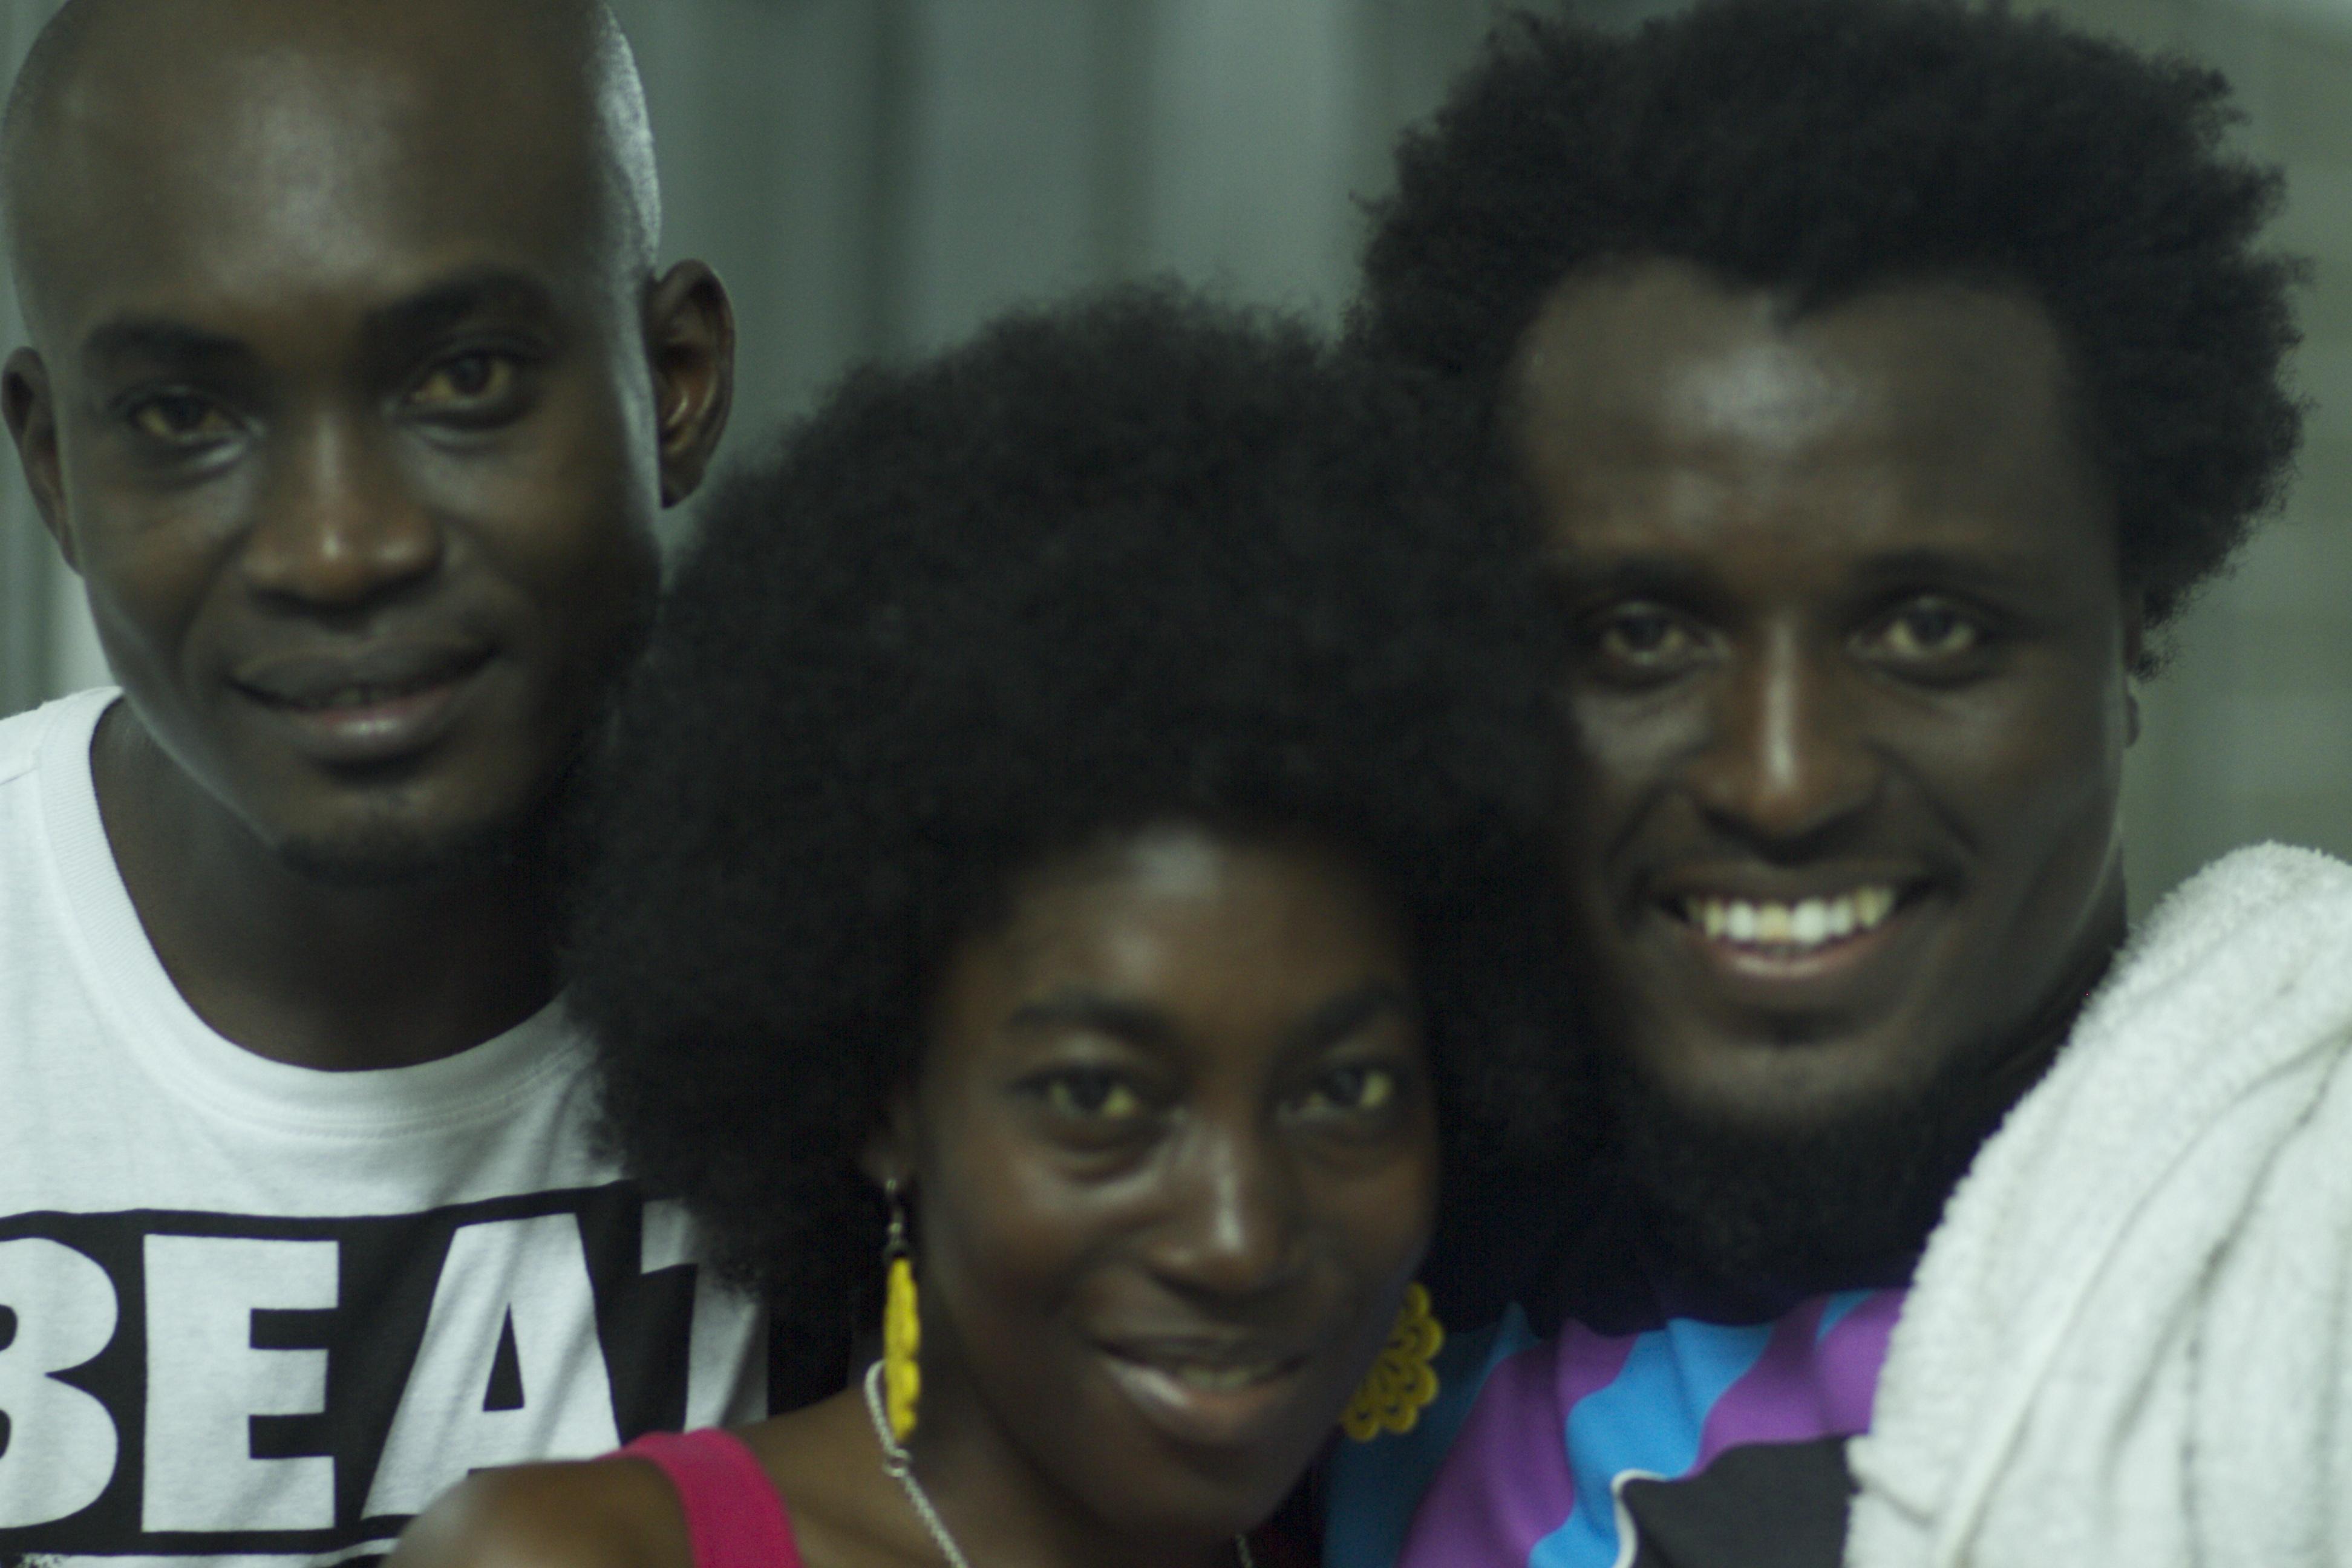 PY Annan, Toke Olagbaju + Mantse Aryeequaye after the show